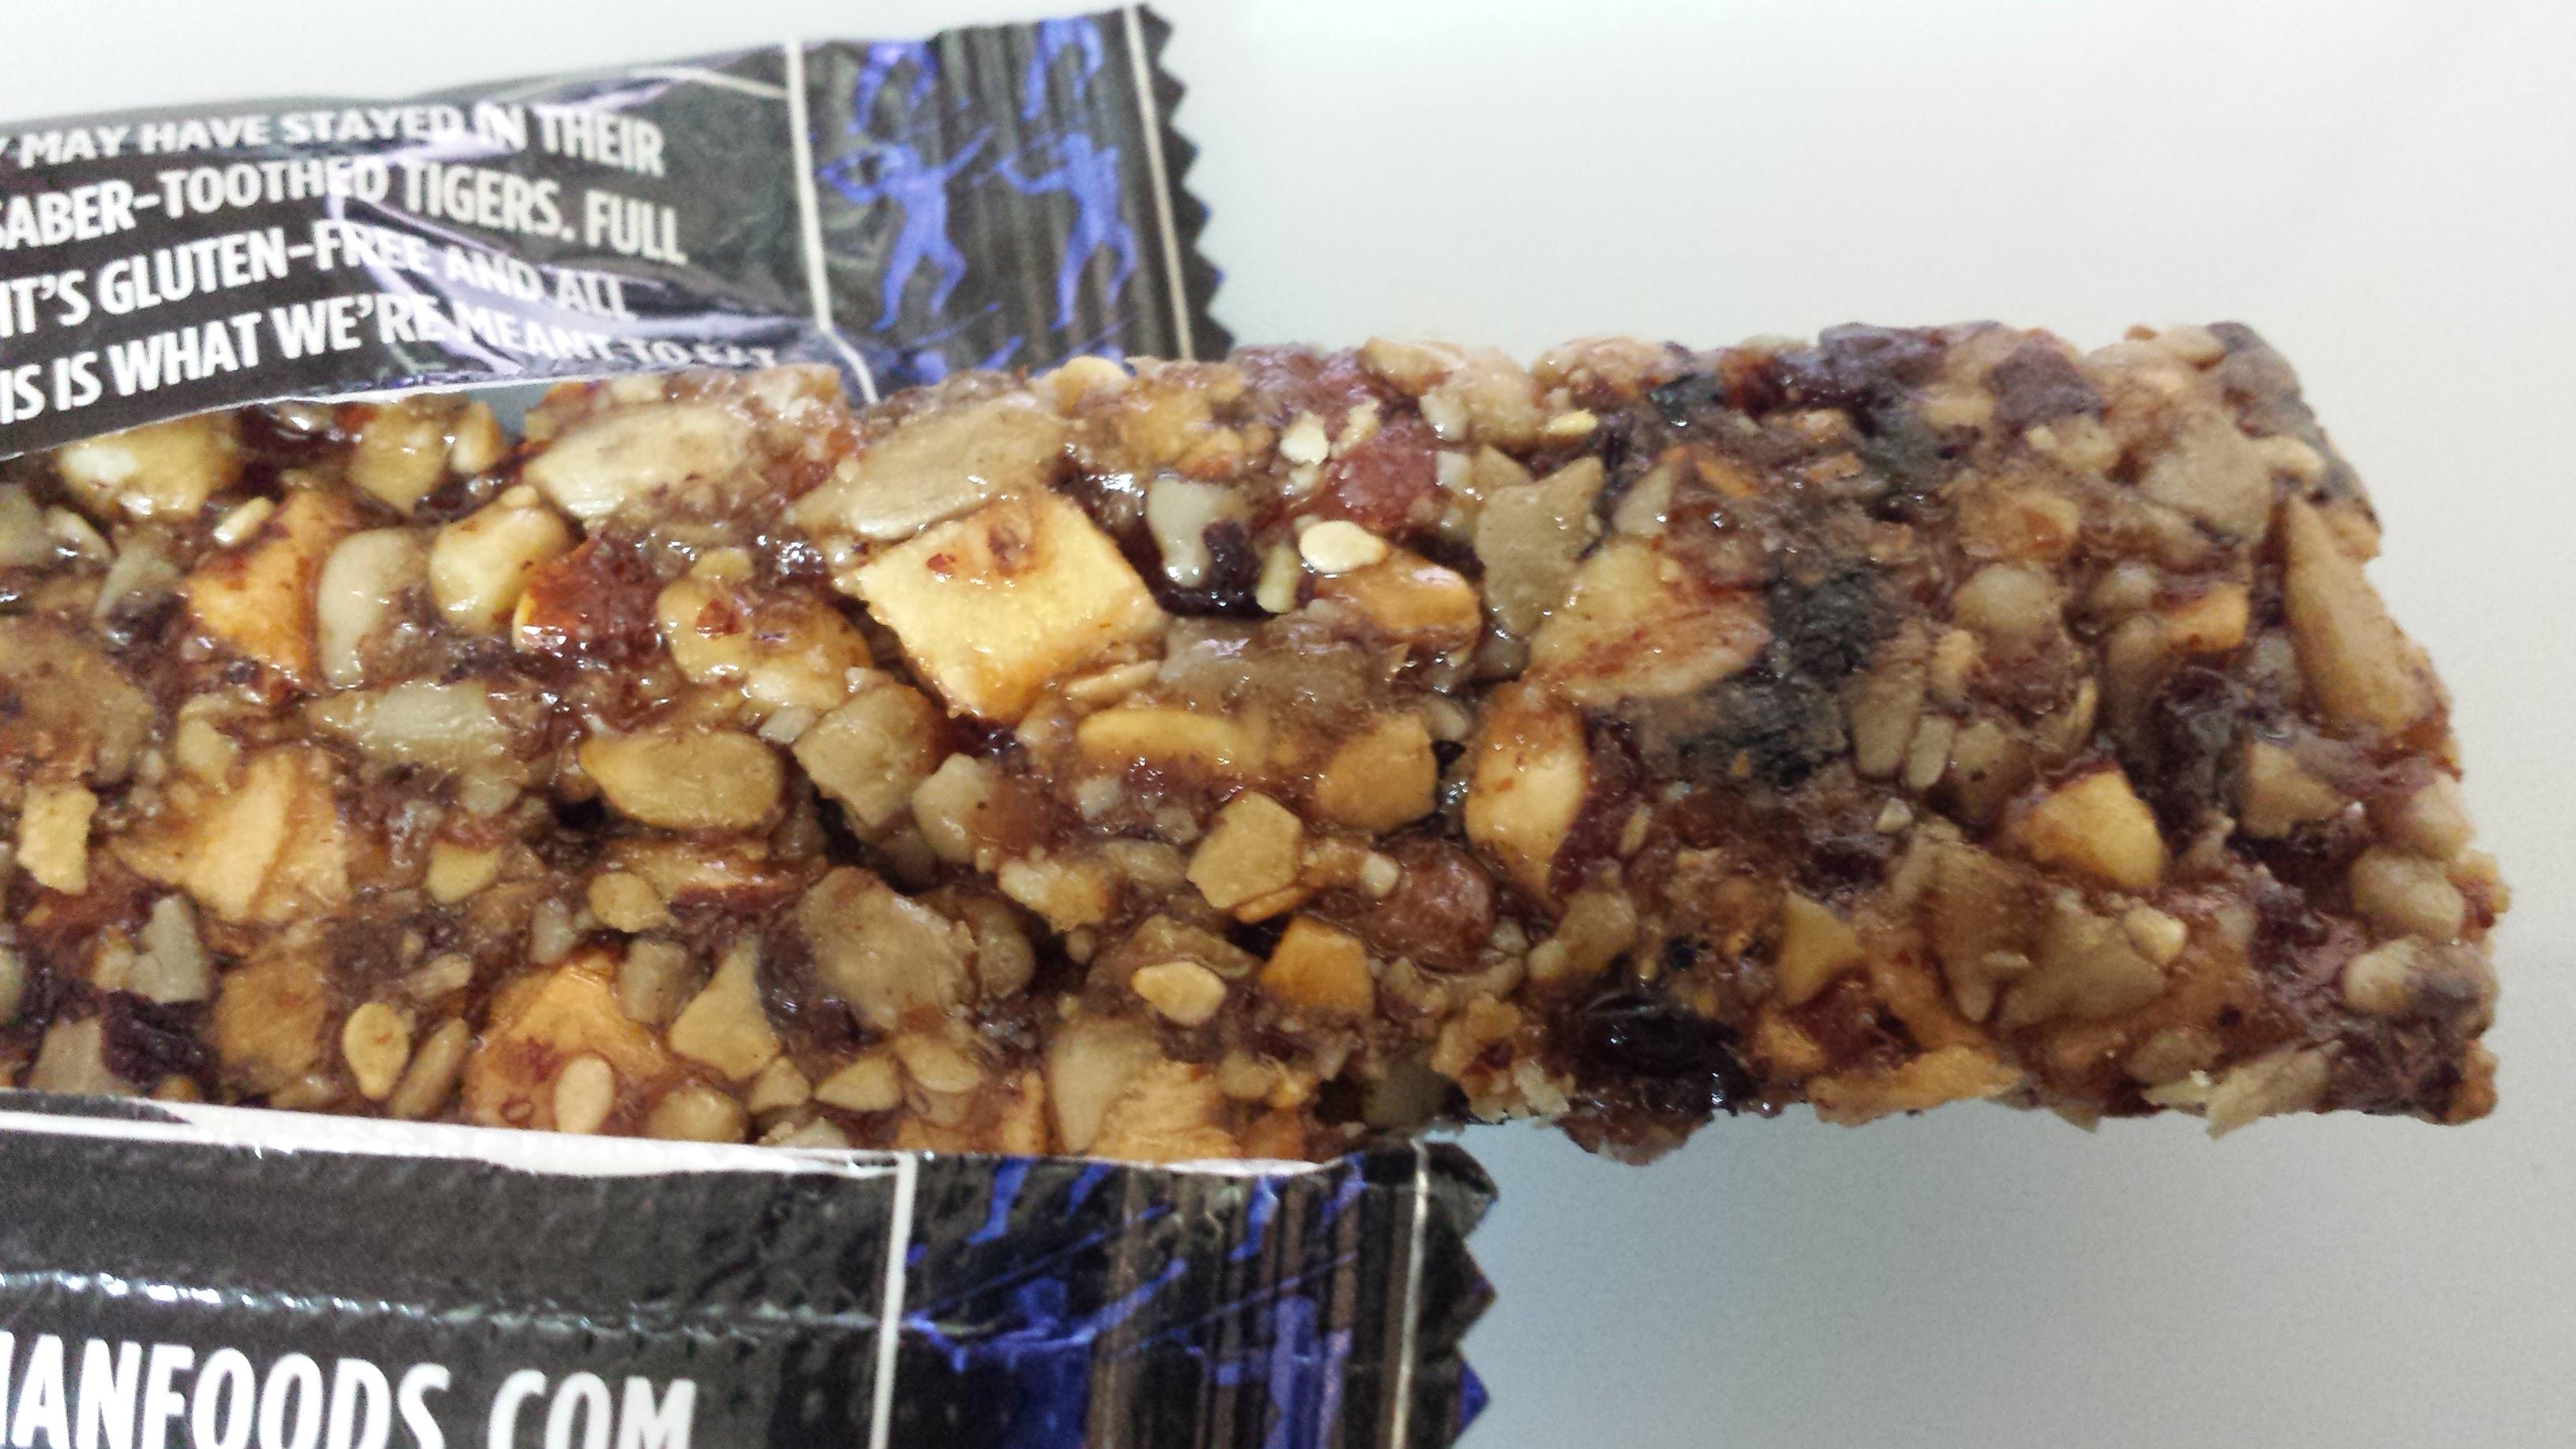 Caveman Food Bars : The caveman bar not a diet food fighting